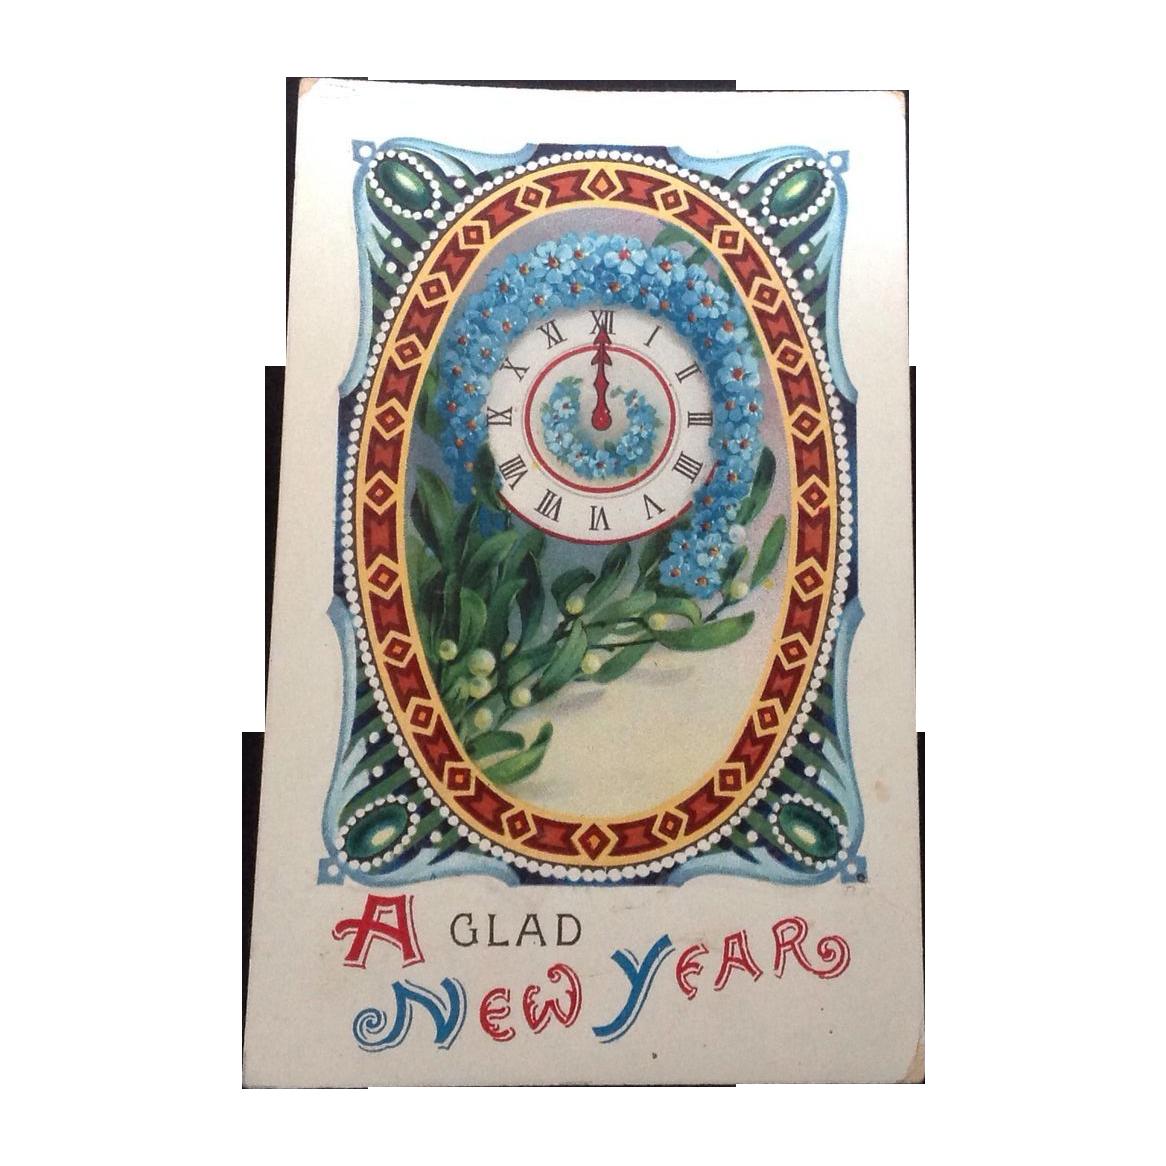 1913 Glad New Year Gel Postcard Printed in Germany